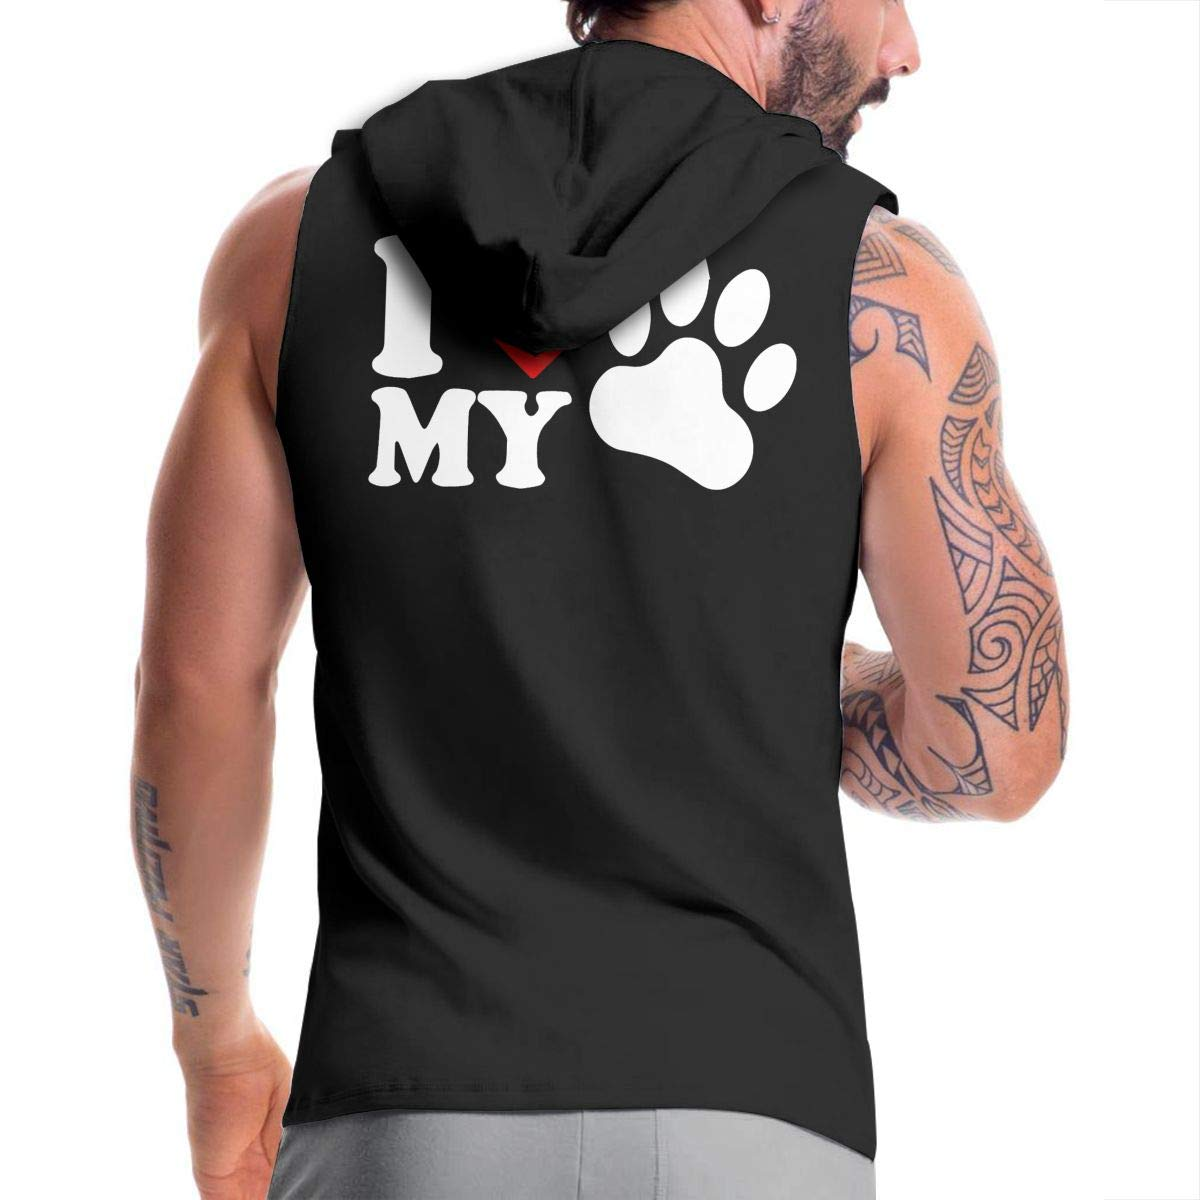 Mens Sleeveless Hoodie I Love My Dog-1 Zip Up Tank Tops